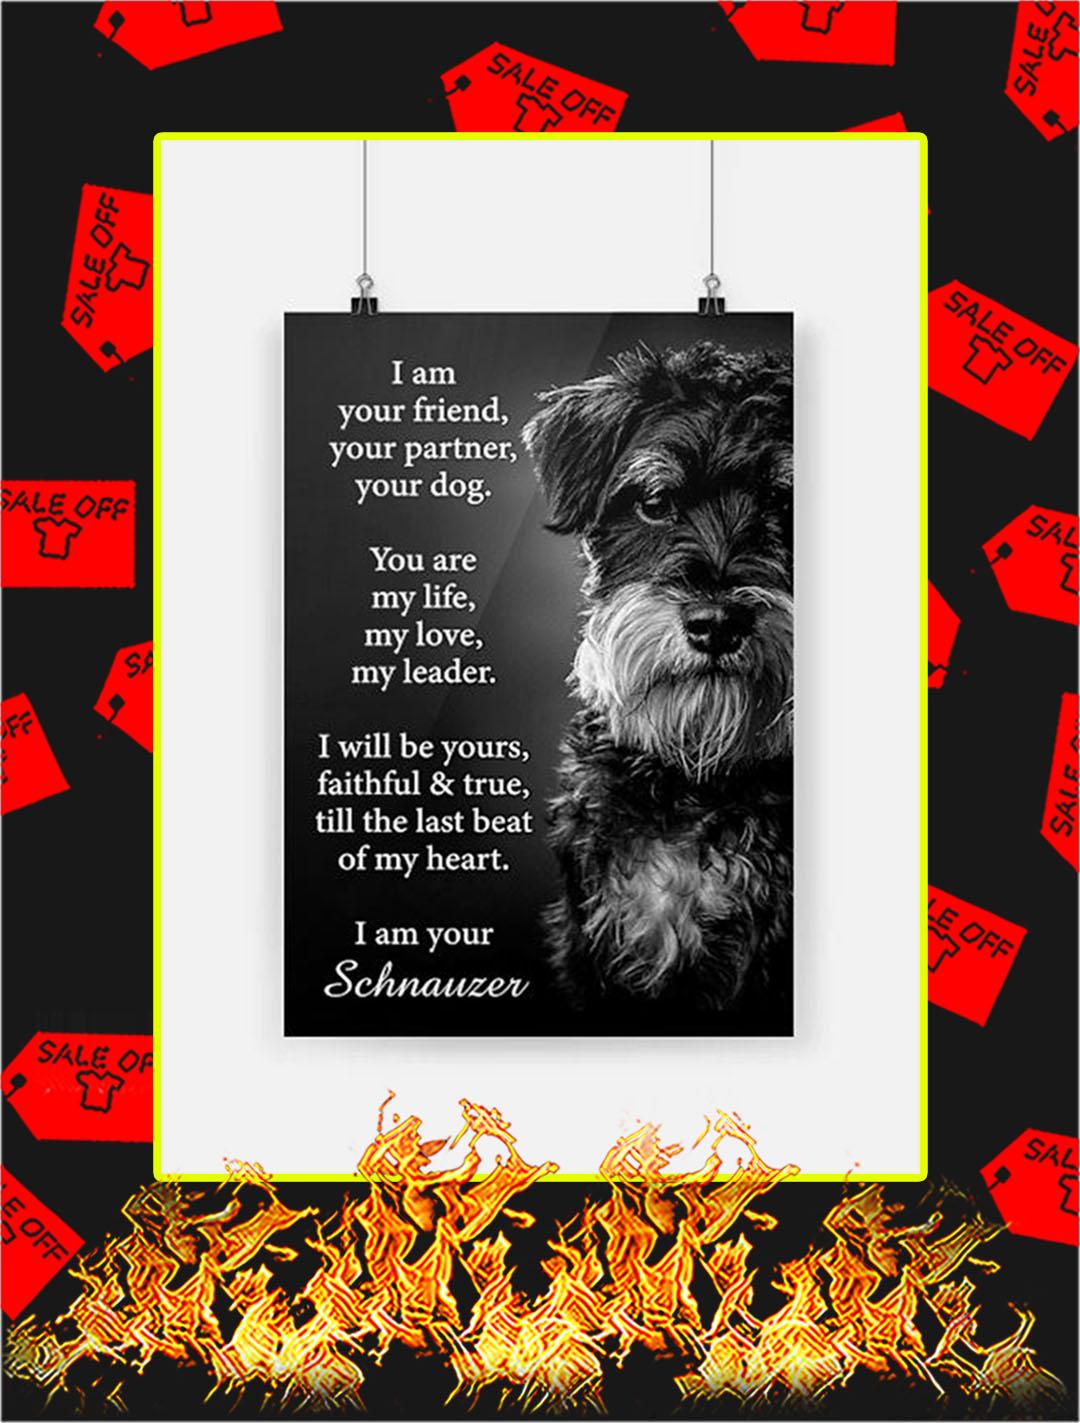 Schnauzer I Am Your Friend Poster - A2